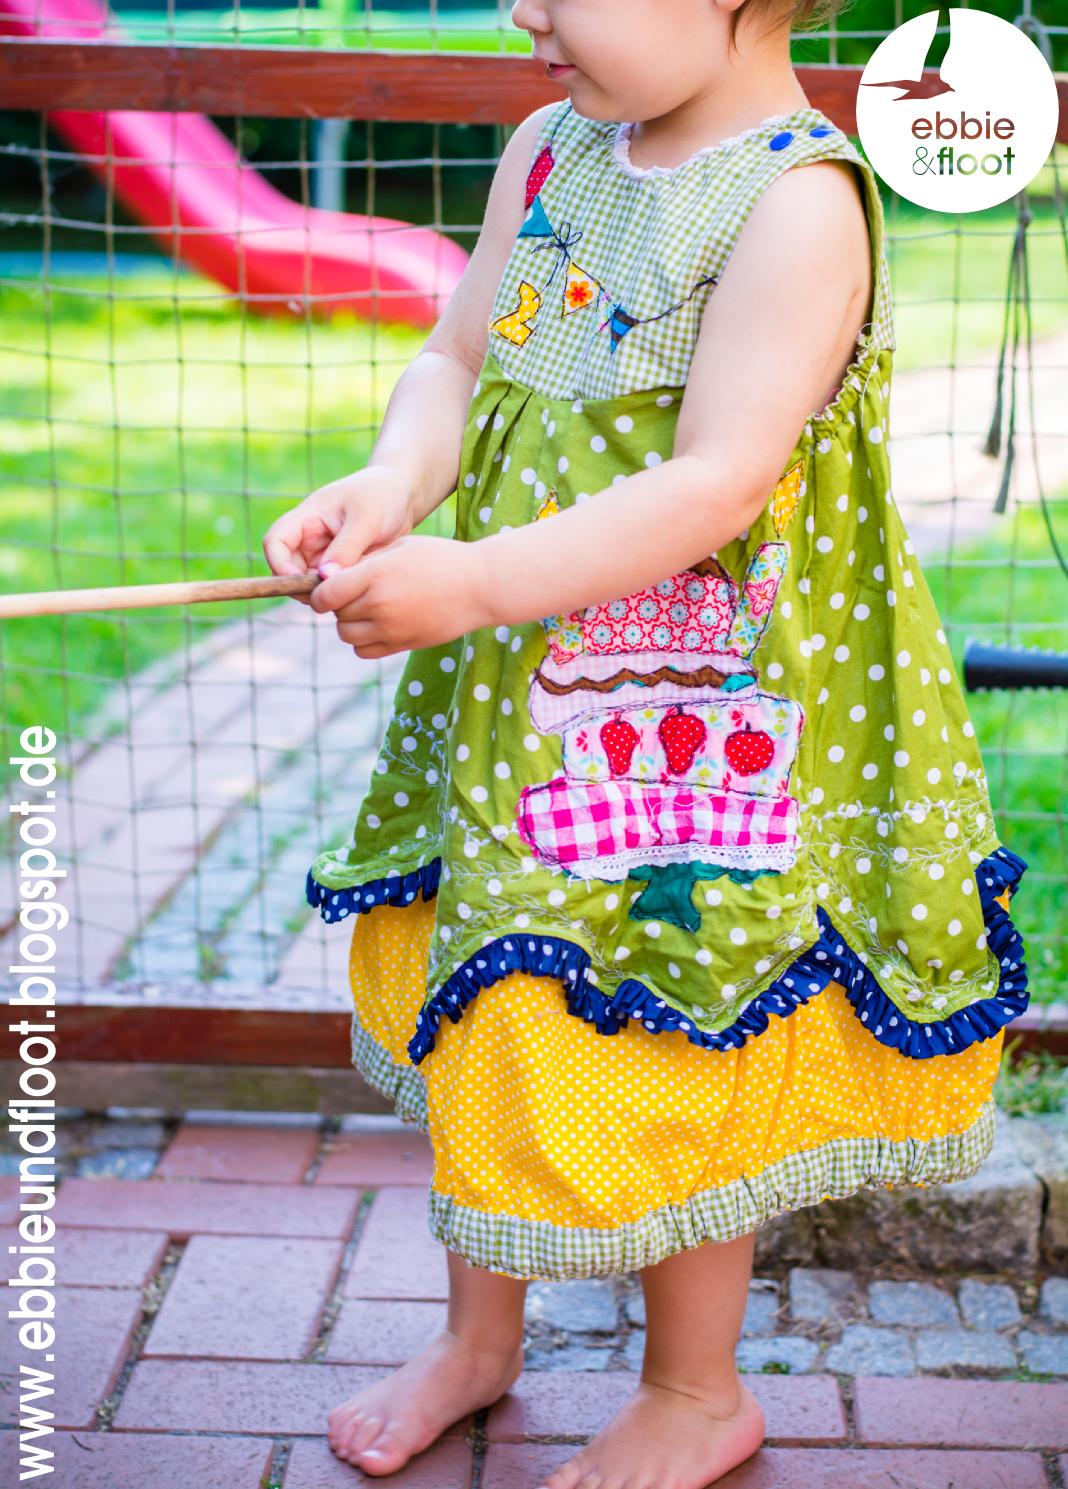 ebbie und floot_farbenmix_Cara_Kleid_Dress_birthday dress_Cake_Ballon_ribbons_ruffels_01